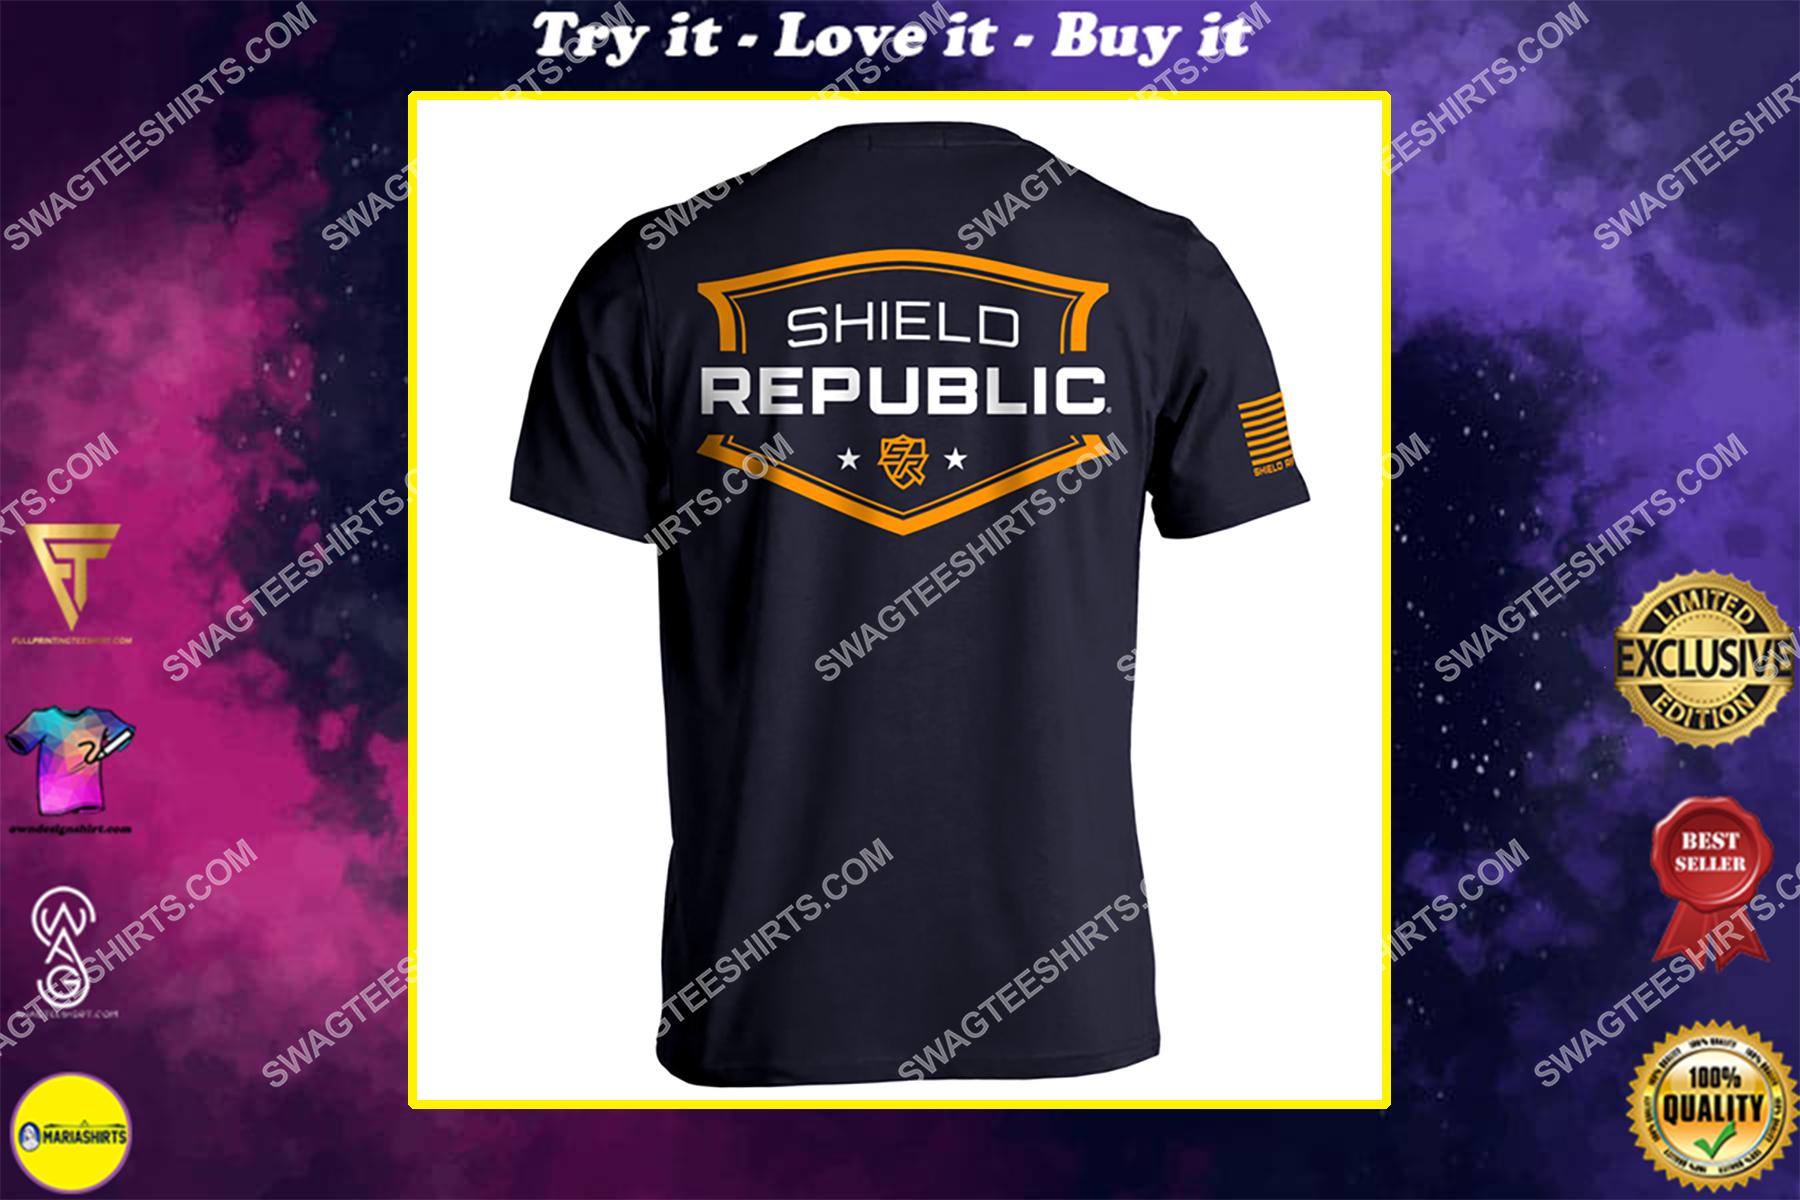 shield republic badge political full print shirt